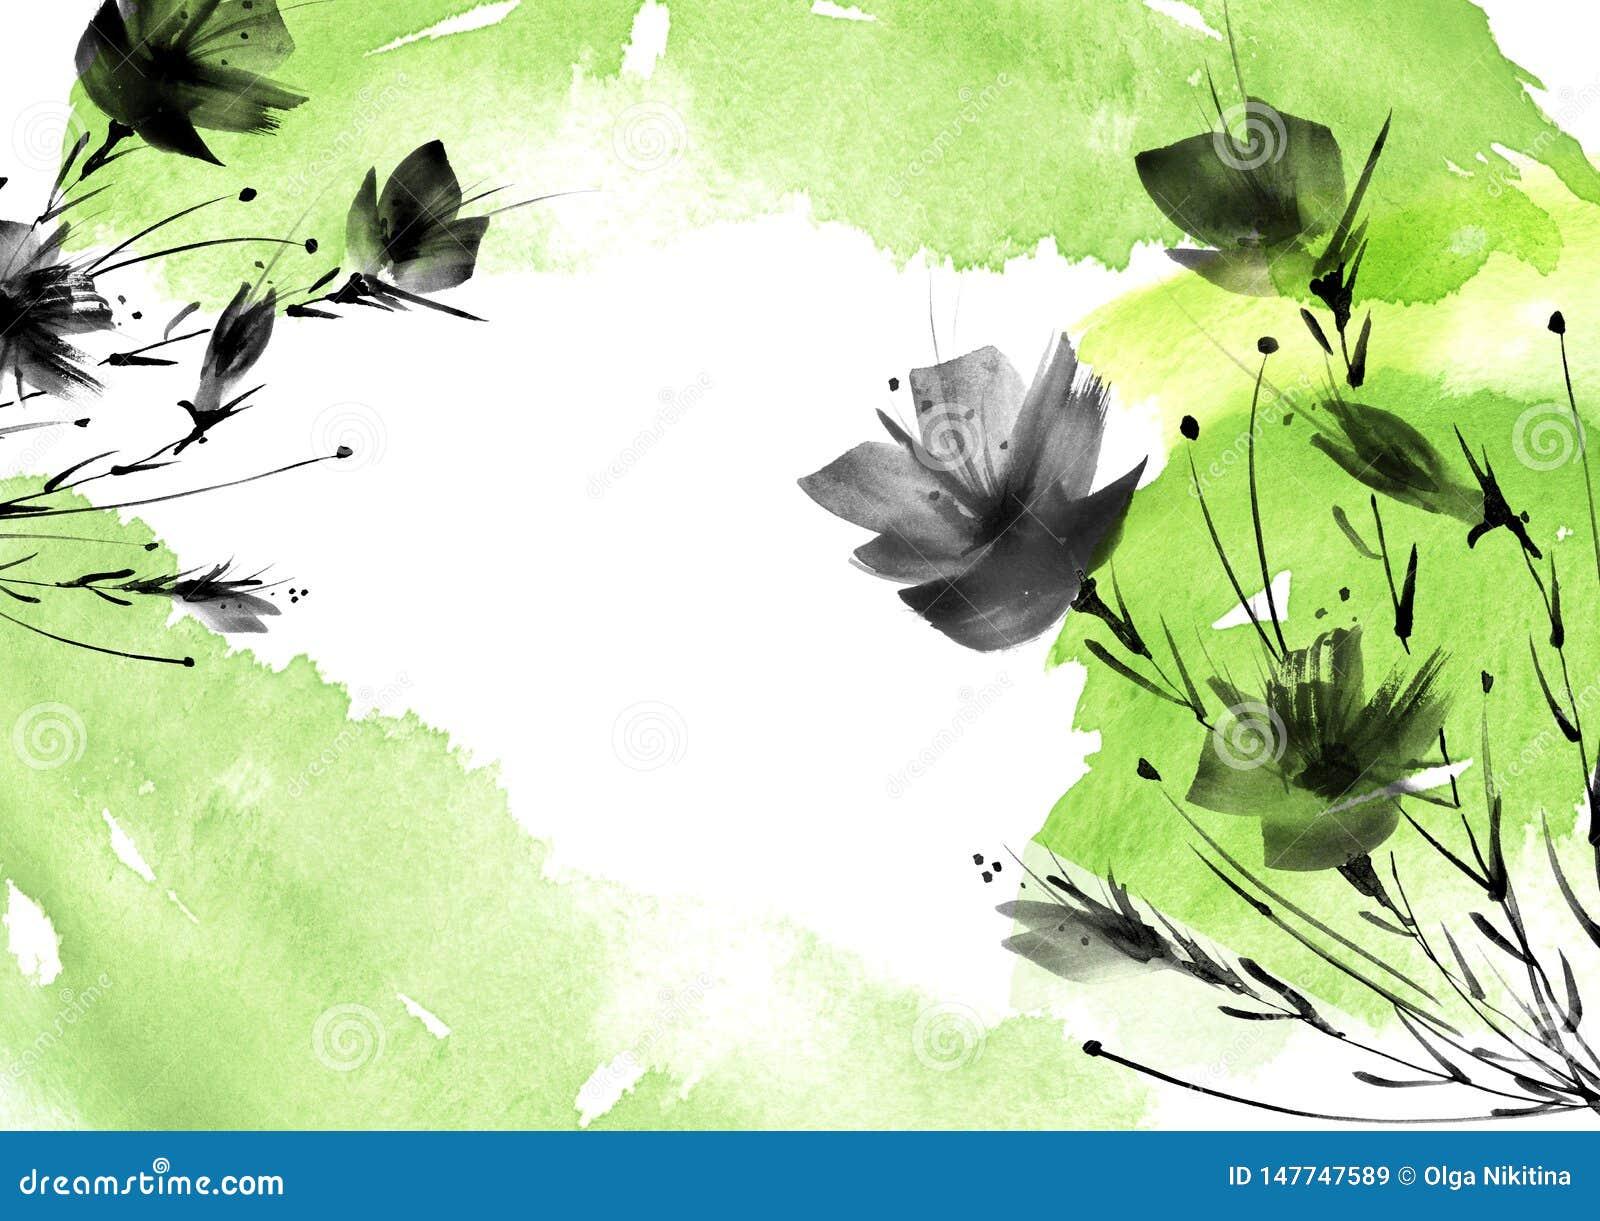 Ild kwiaty, pole, ogr?d - leluja, sylwetka maczki, r??e